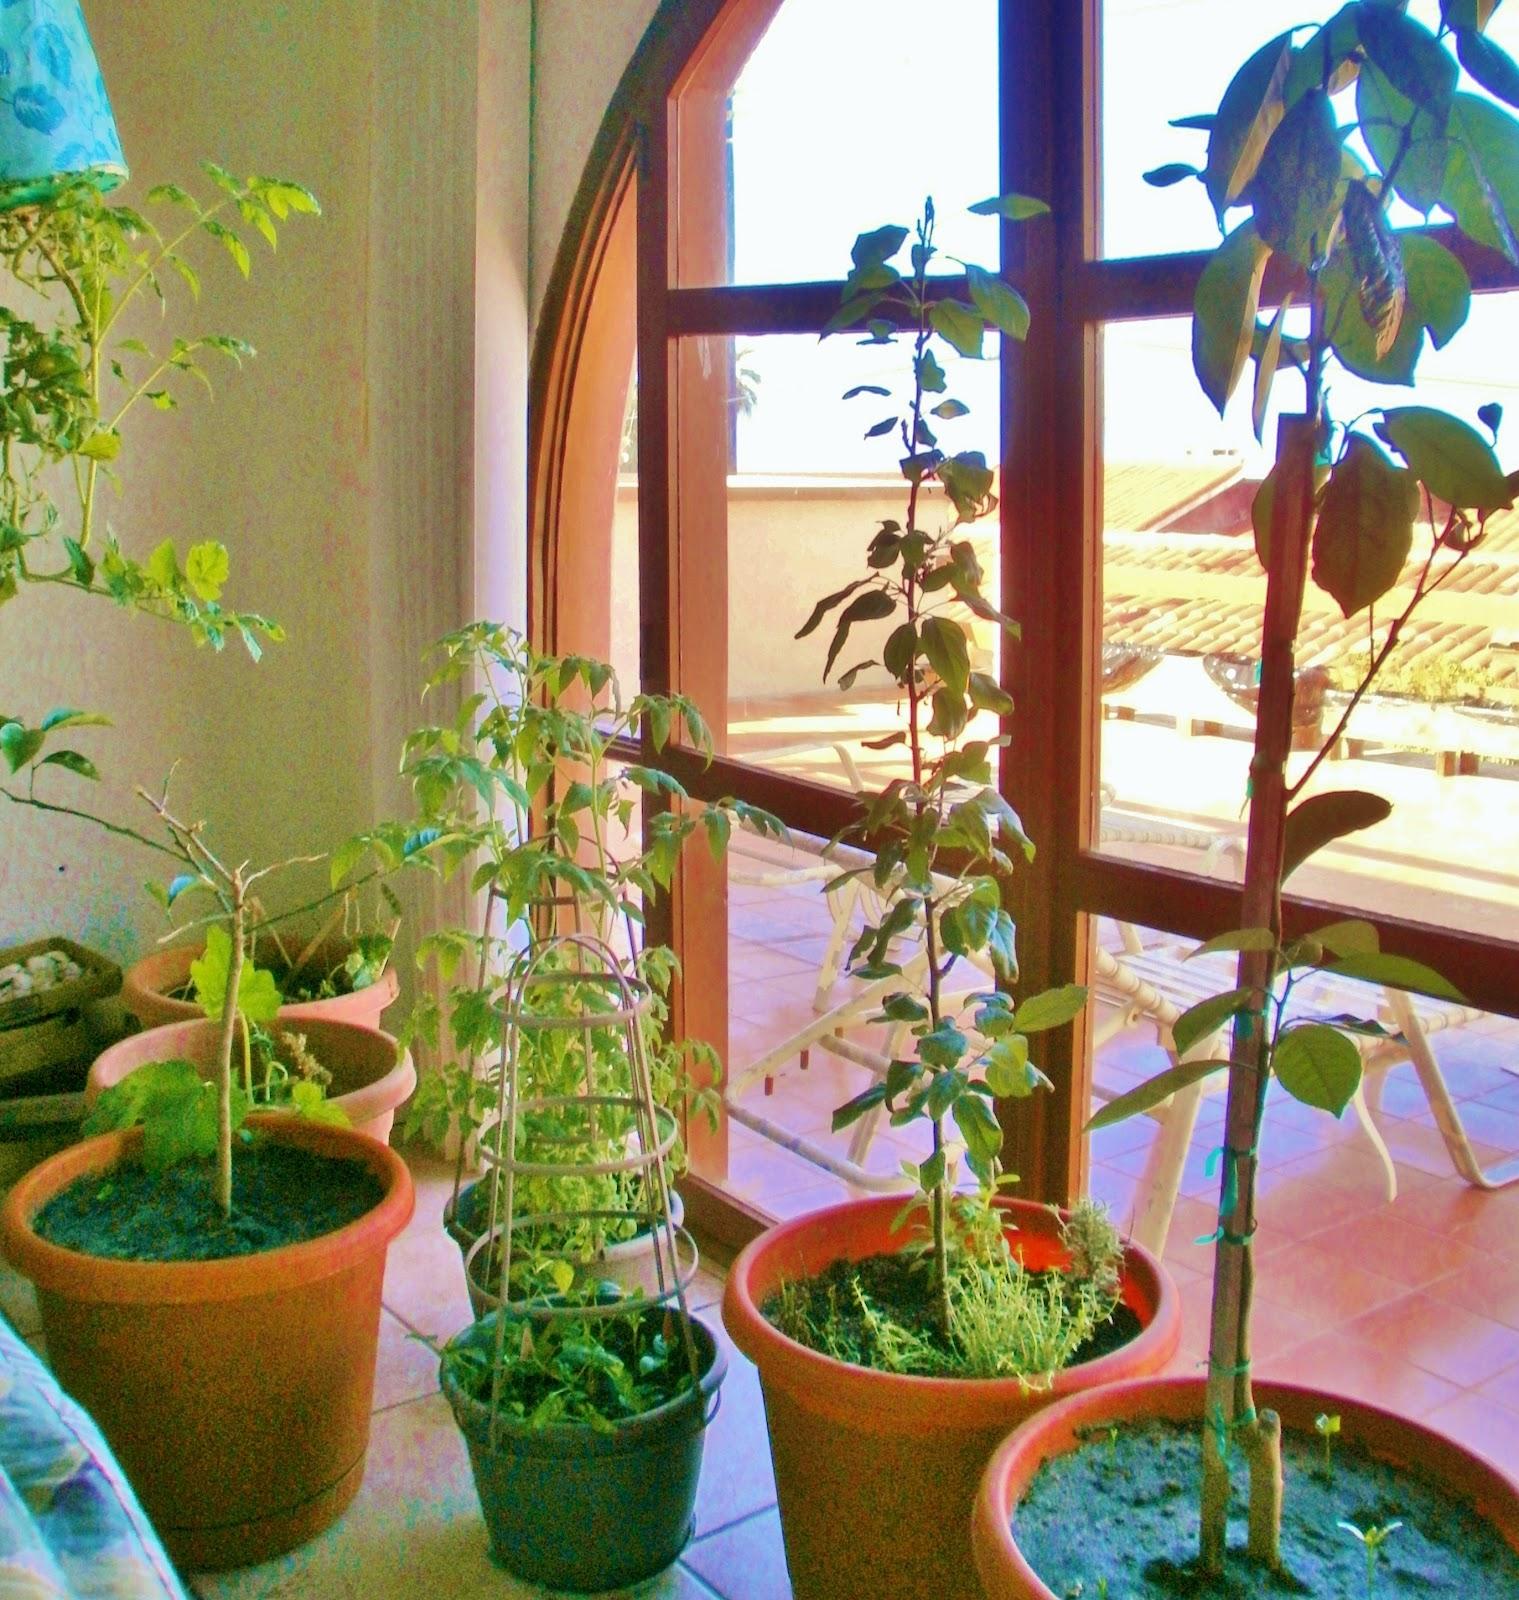 Twinas 39 family magazine growing avocados garlic herbs for Indoor gardening pdf